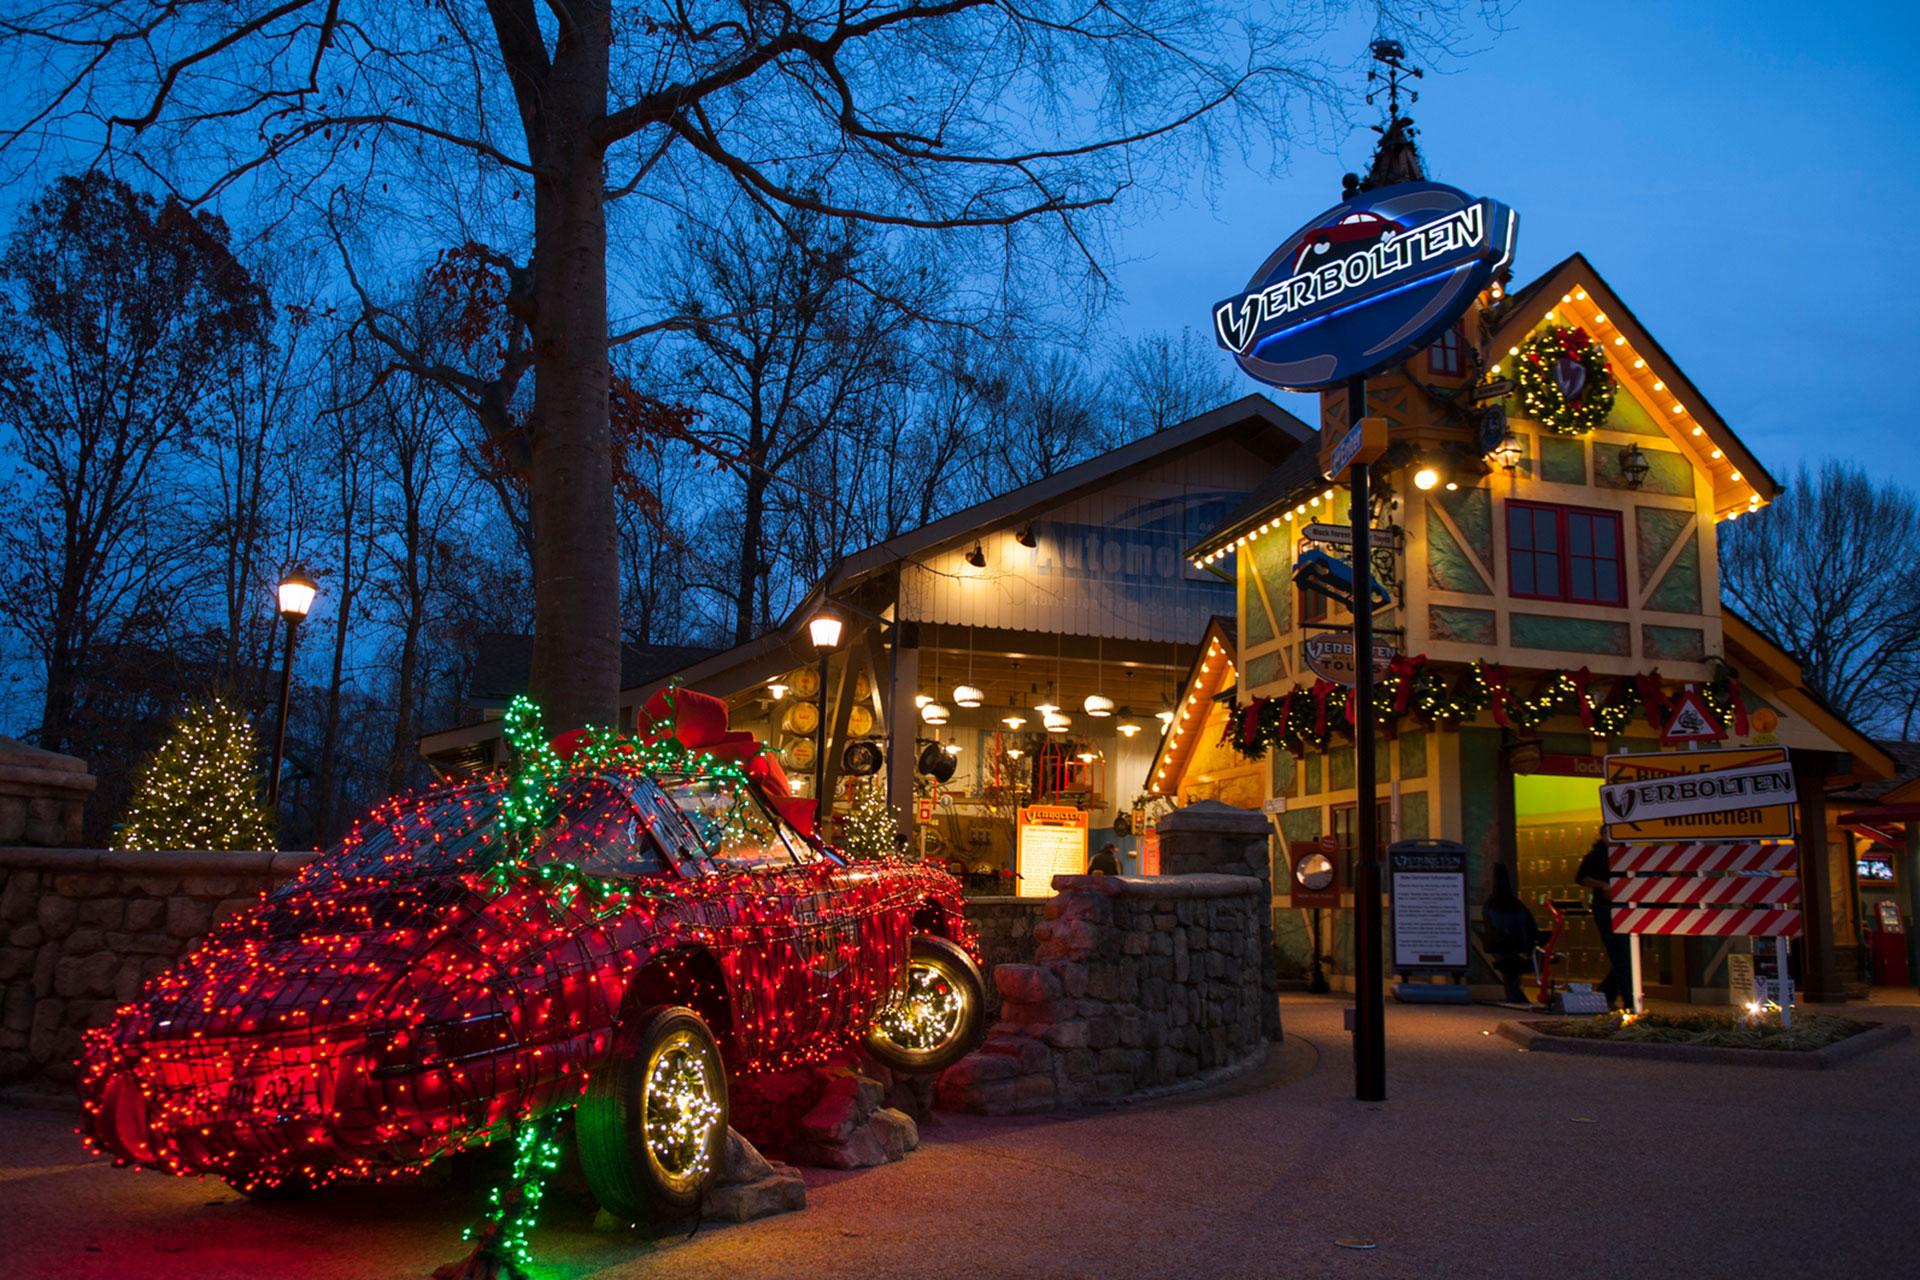 Christmas Town at Busch Gardens Williamsburg - Courtesy of Busch Gardens Williamsburg